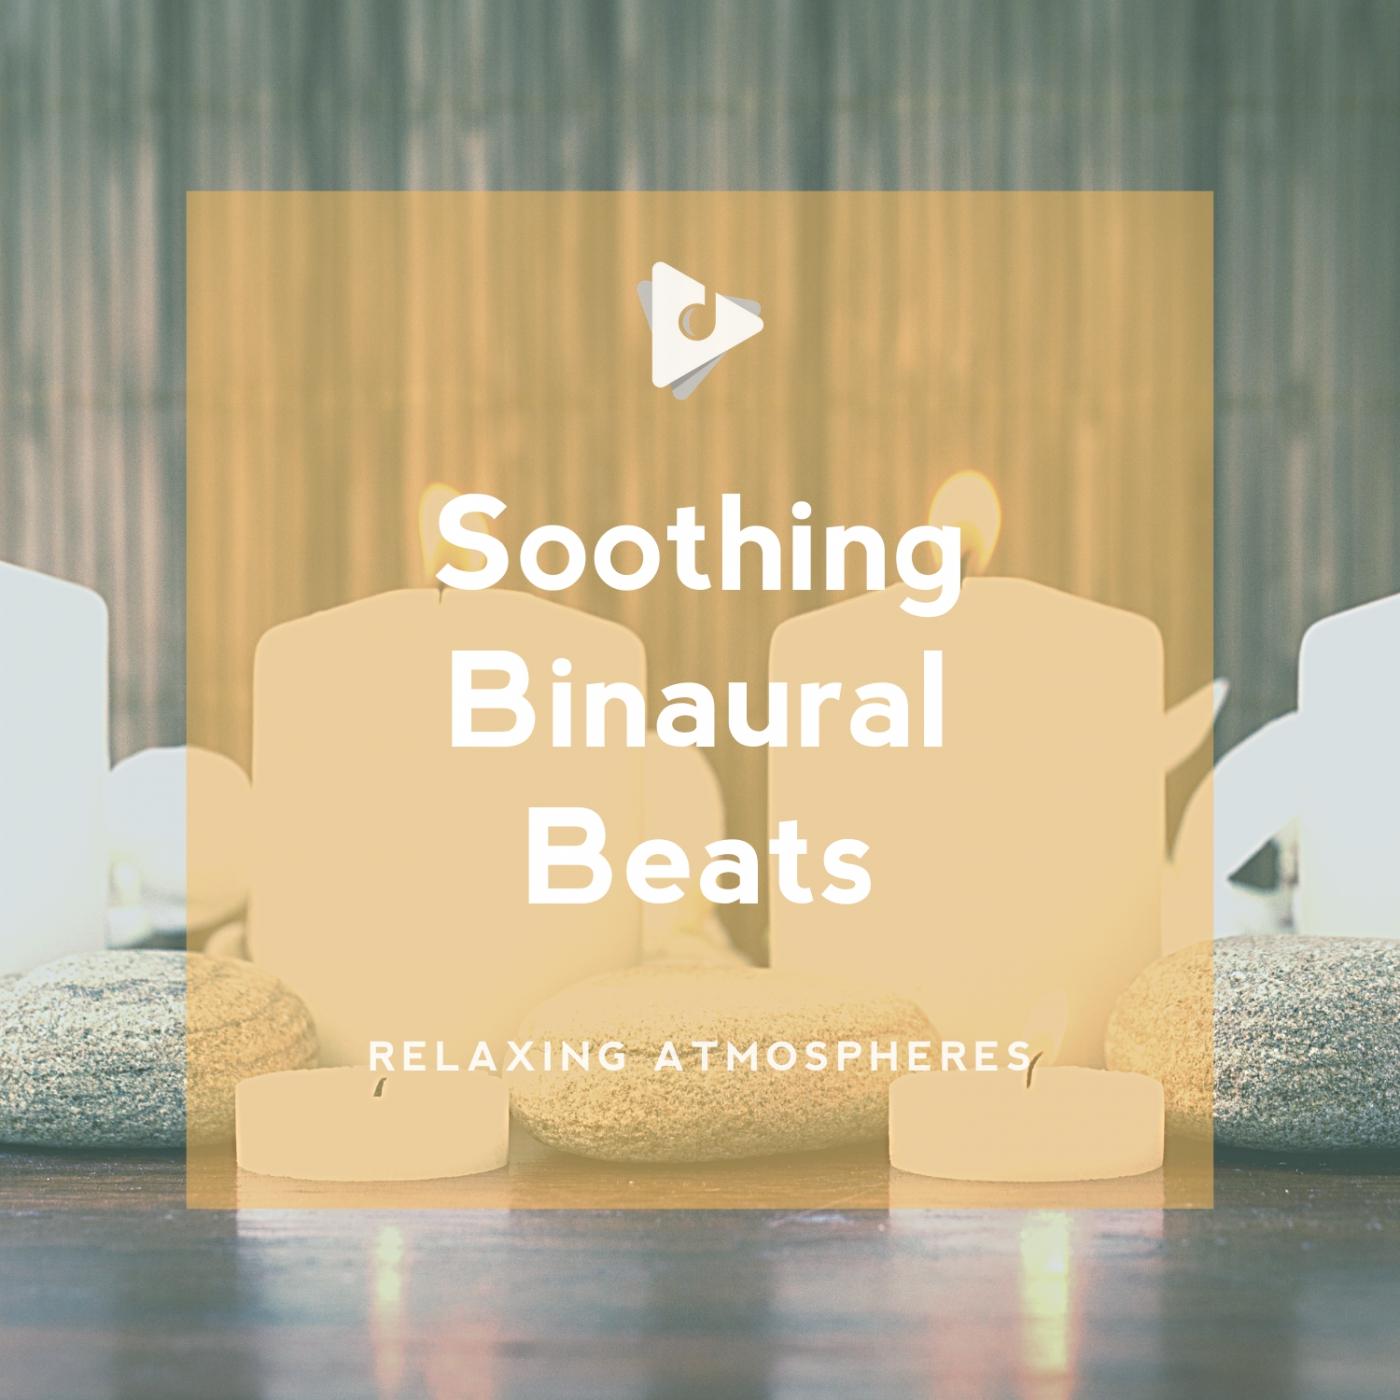 Soothing Binaural Beats